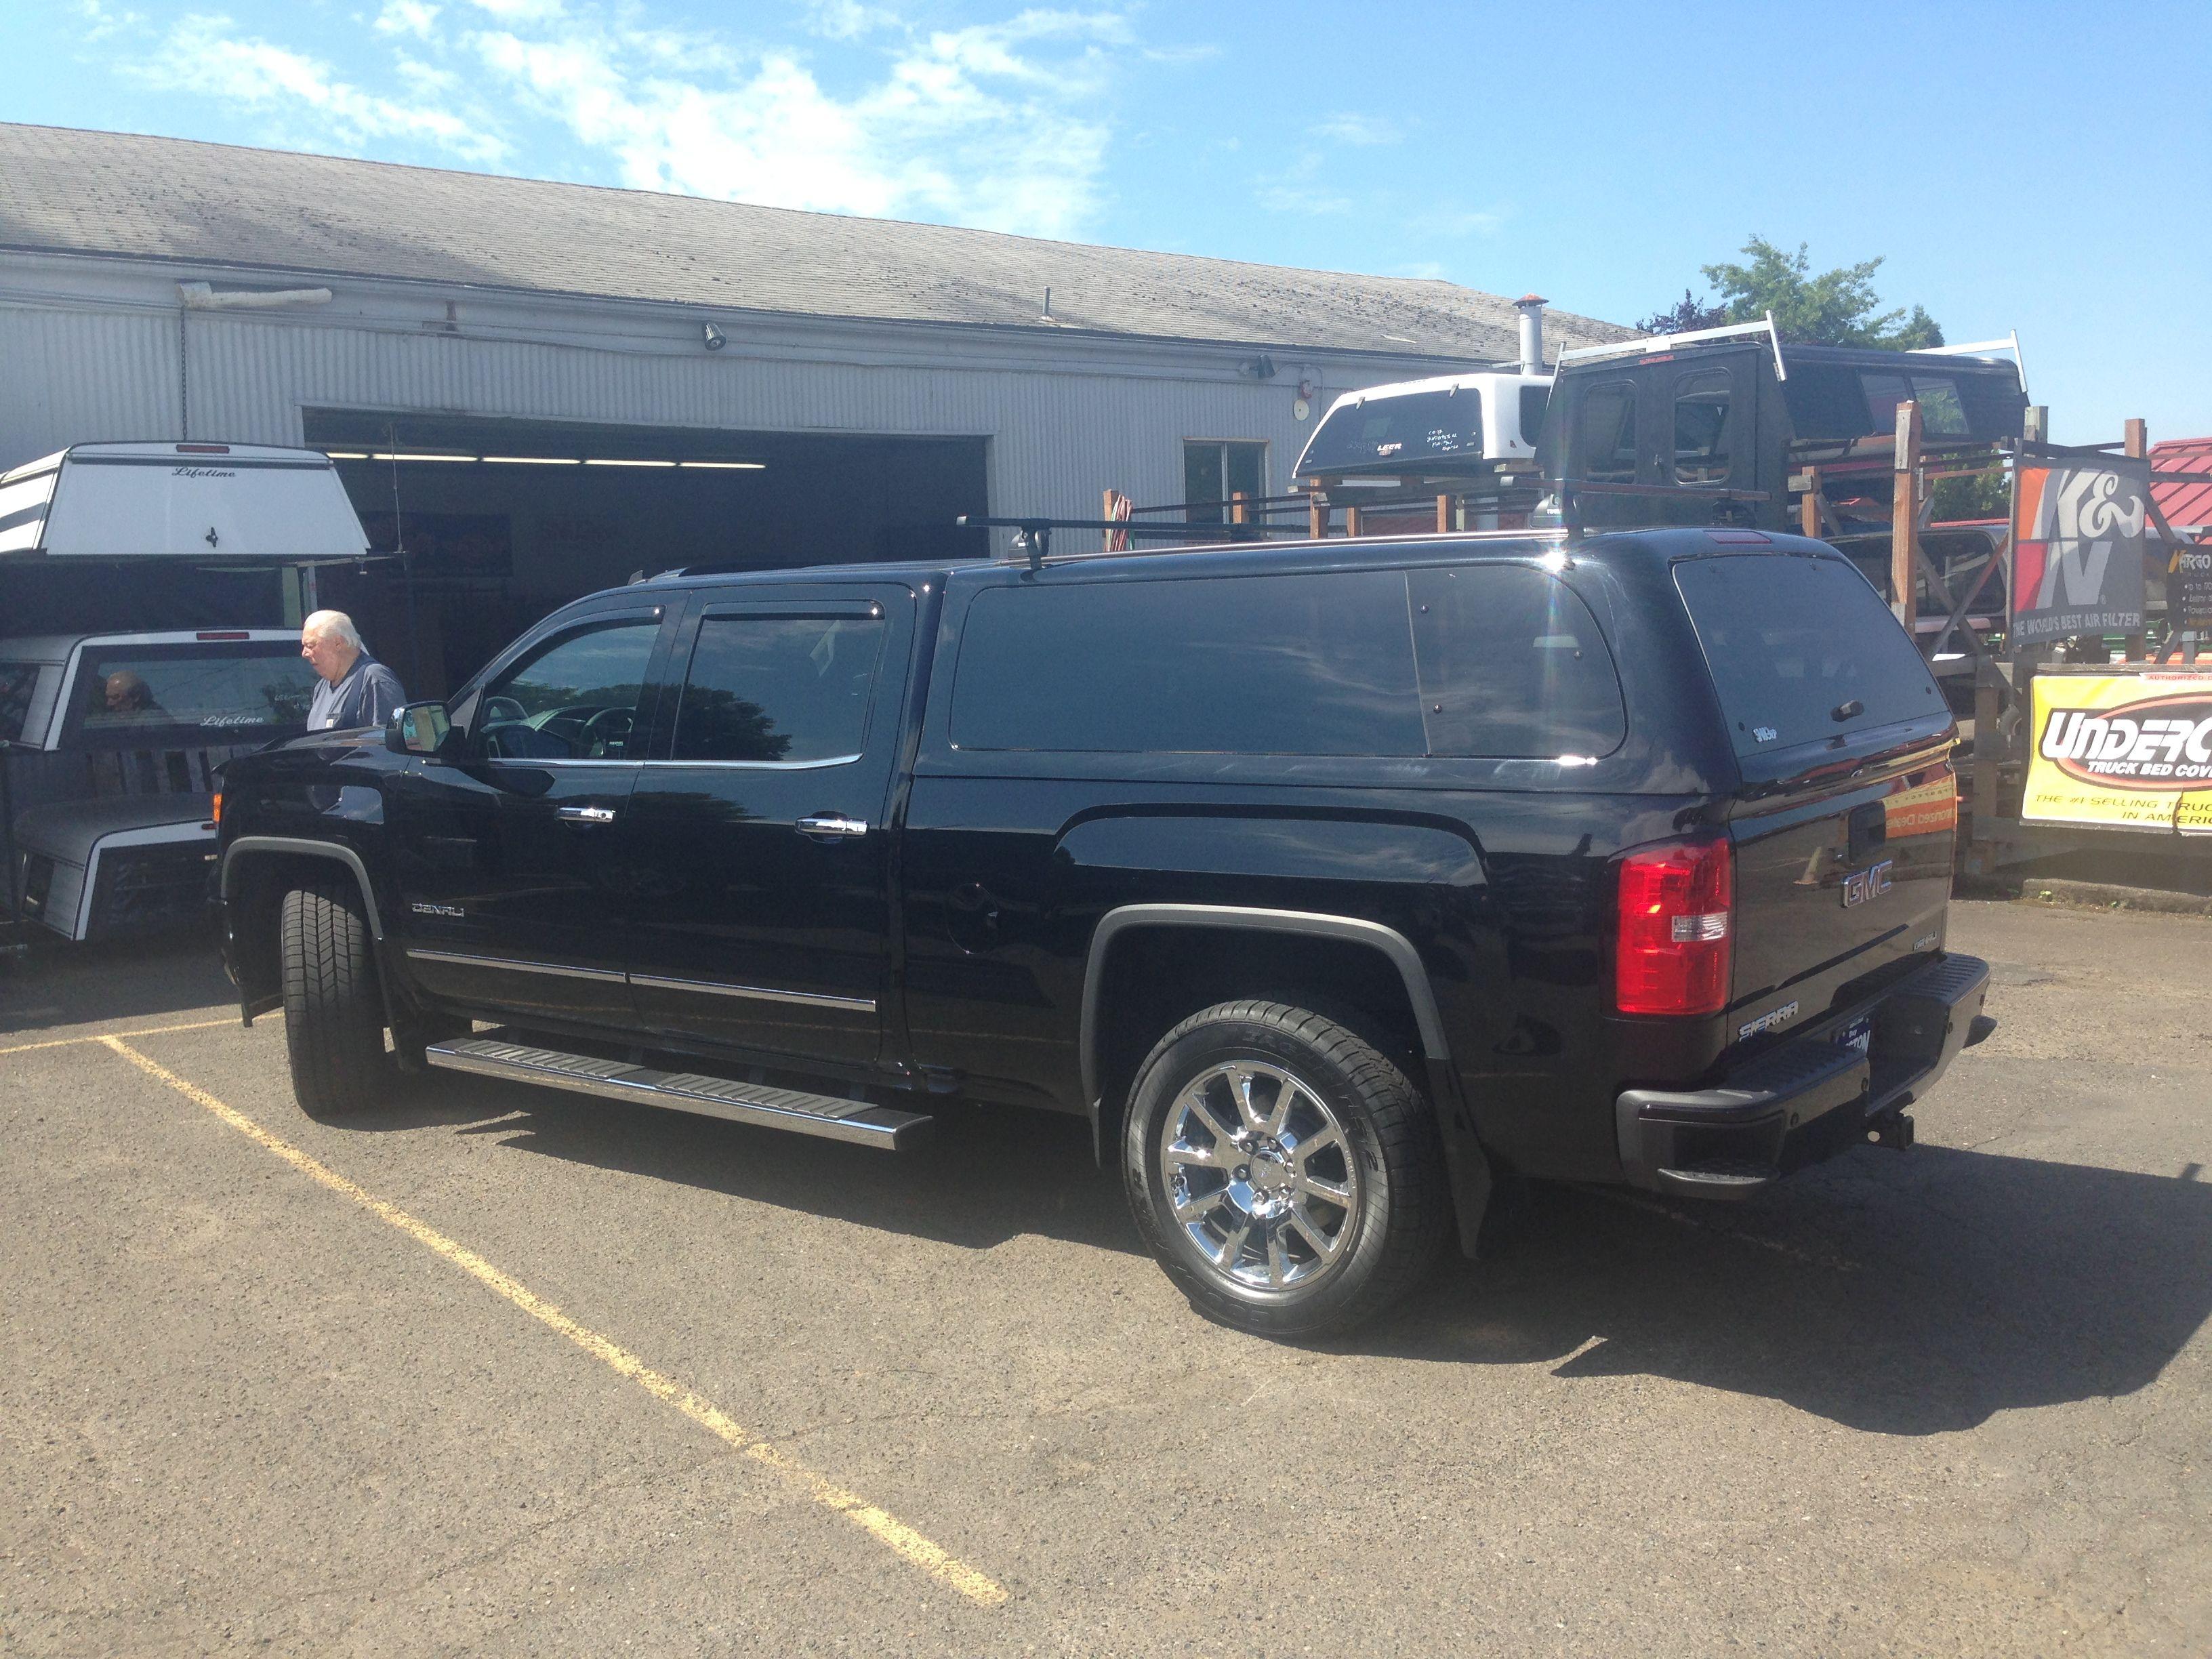 Chevrolet Denali SnugTop Super Sport equipped with Thule racks